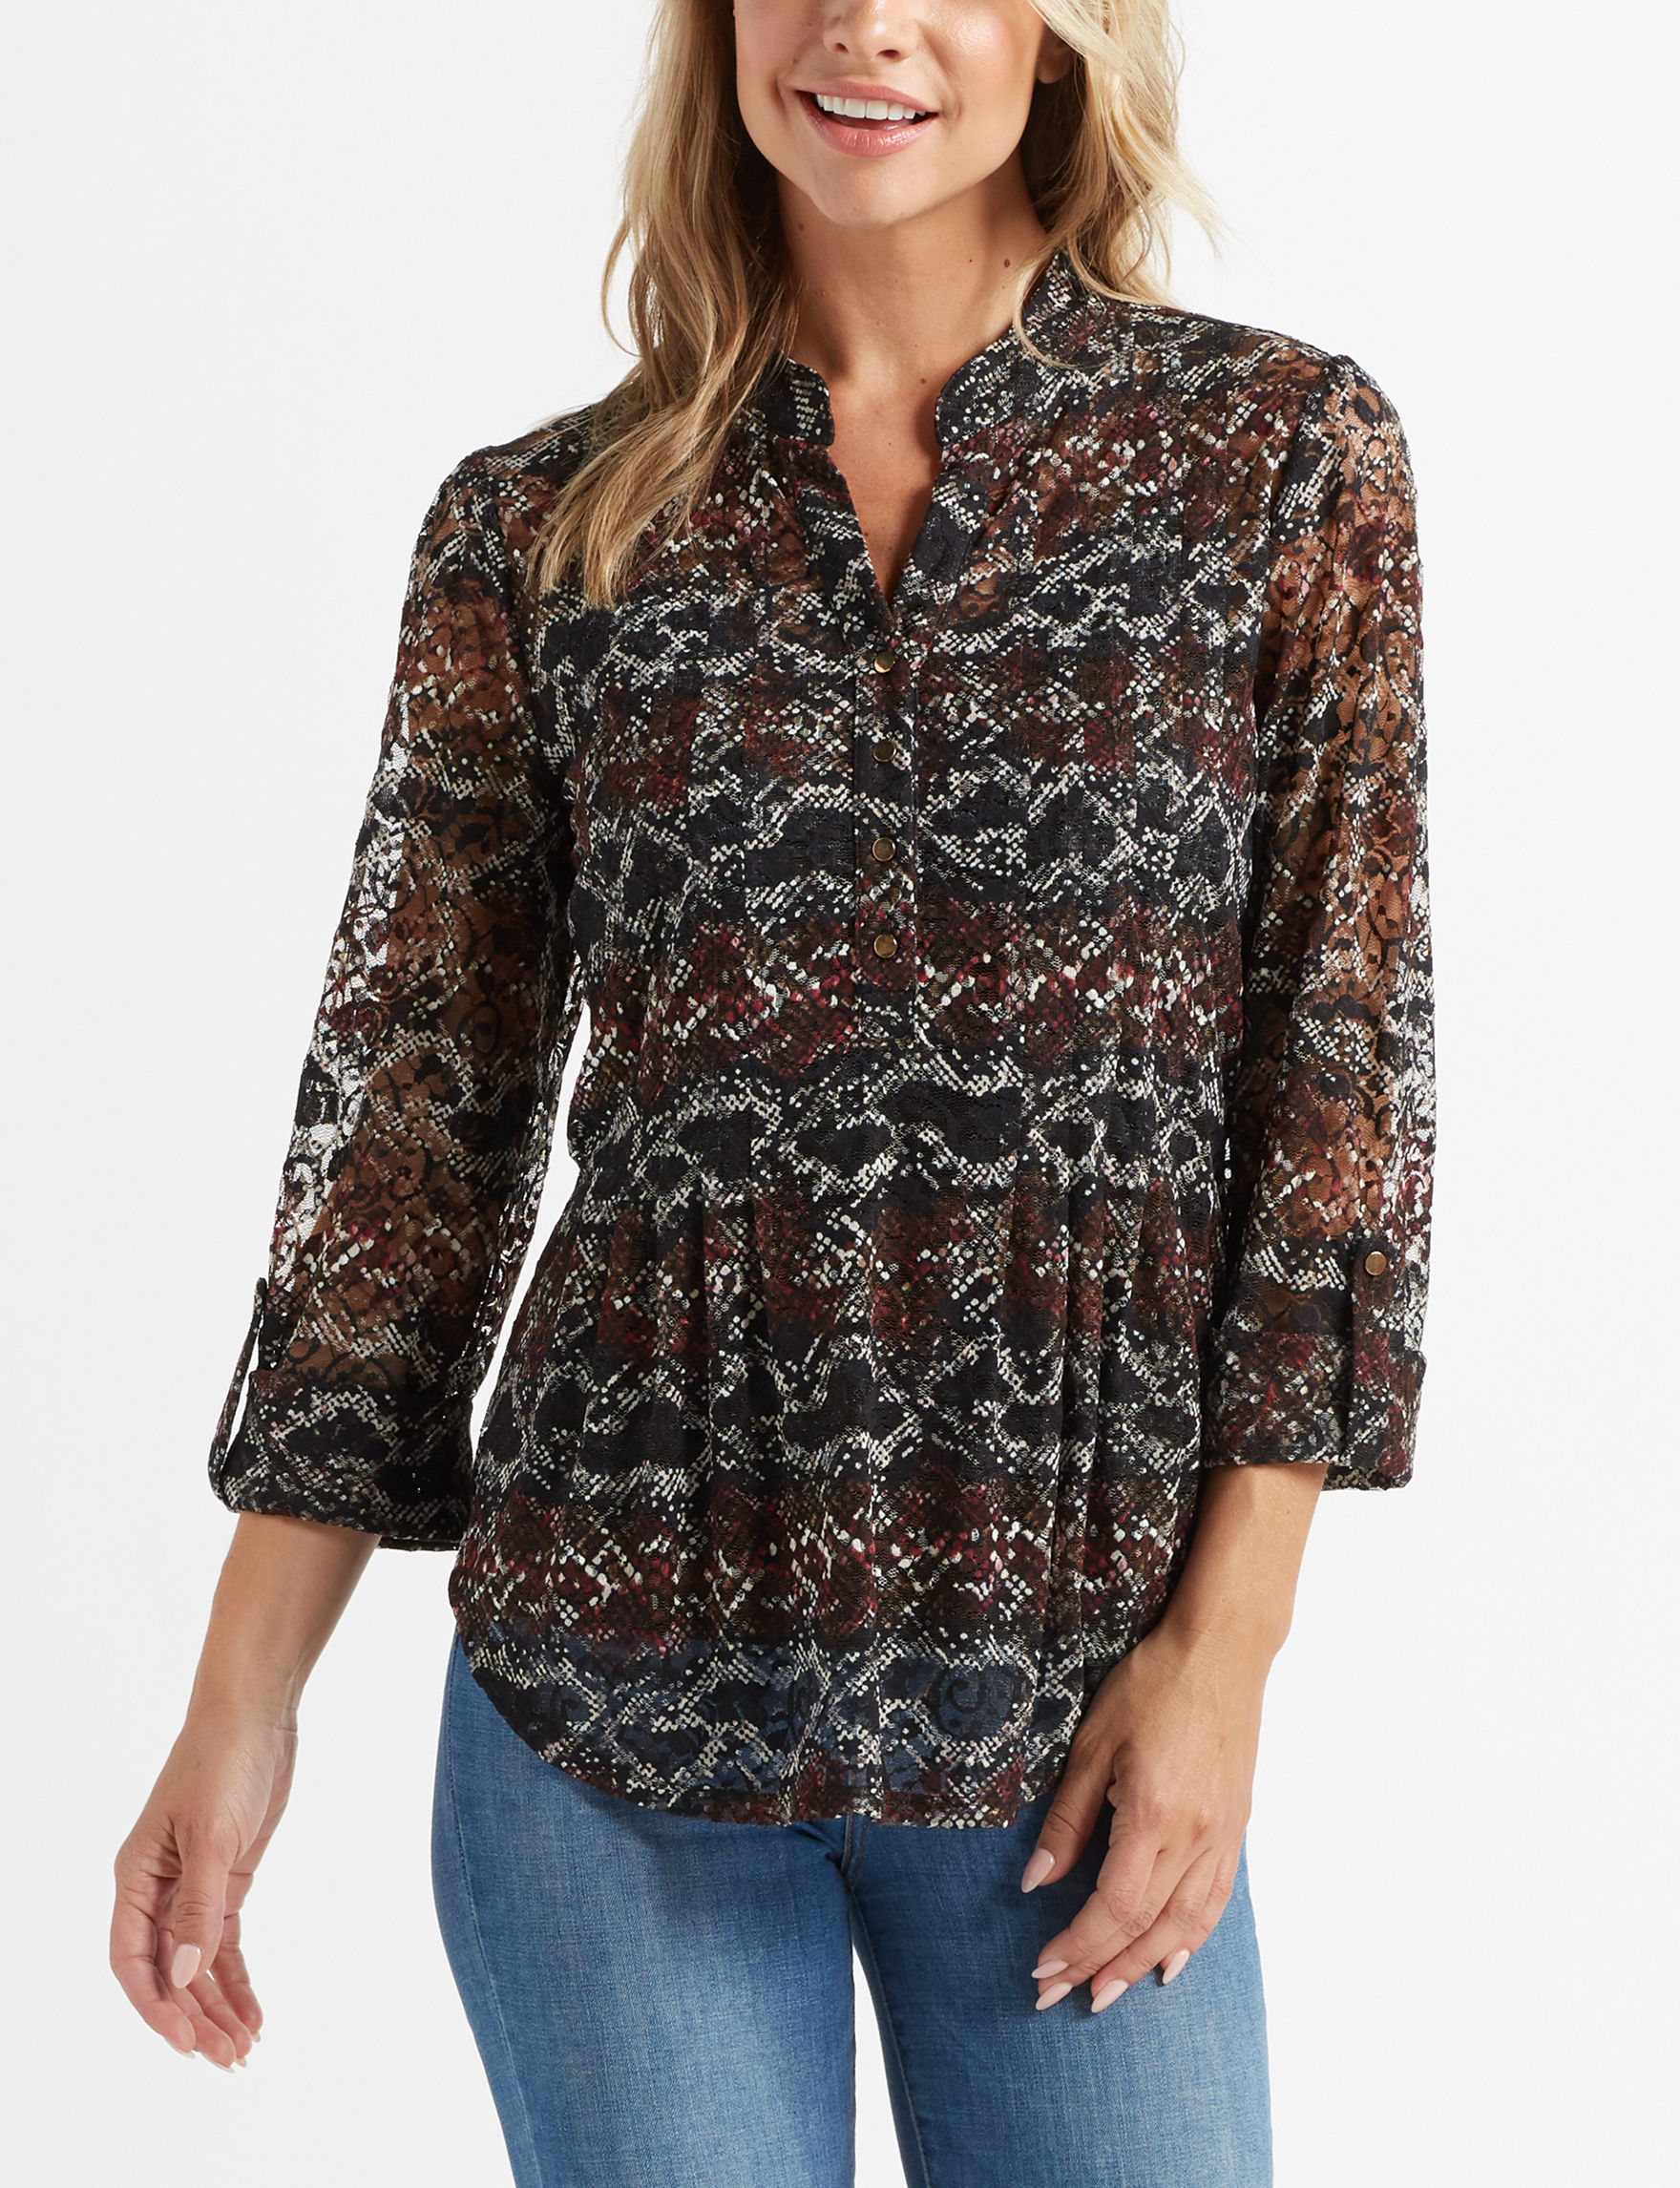 Cocomo Black Shirts & Blouses